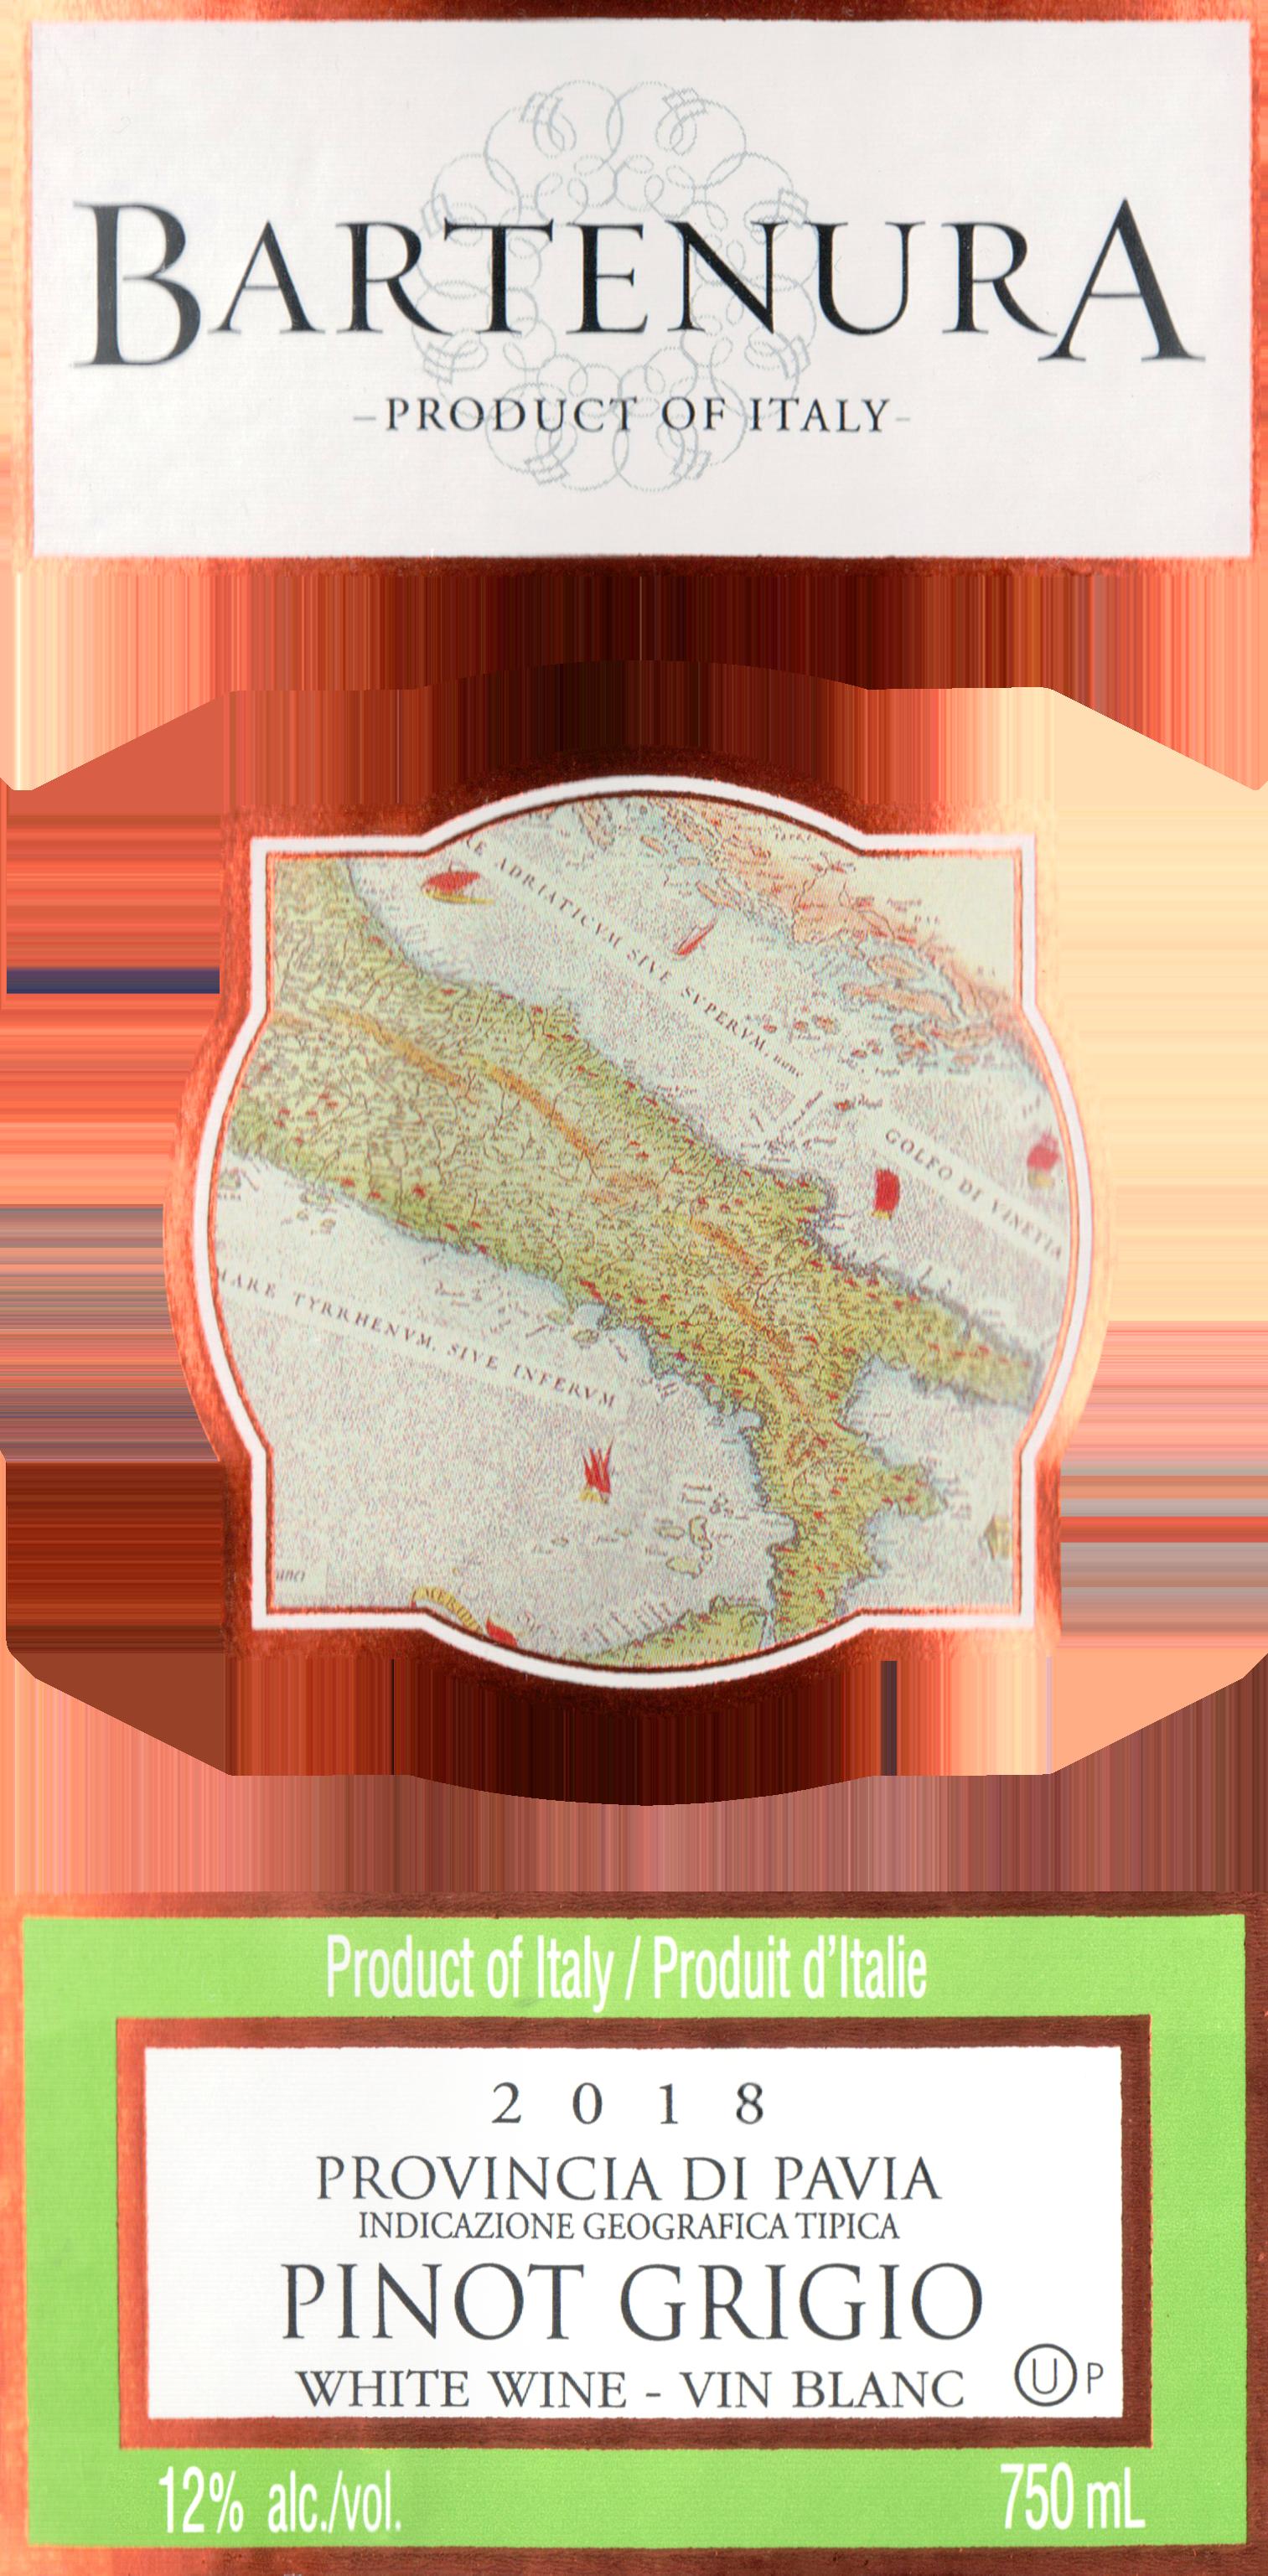 Bartenura Pinot Grigio 2018